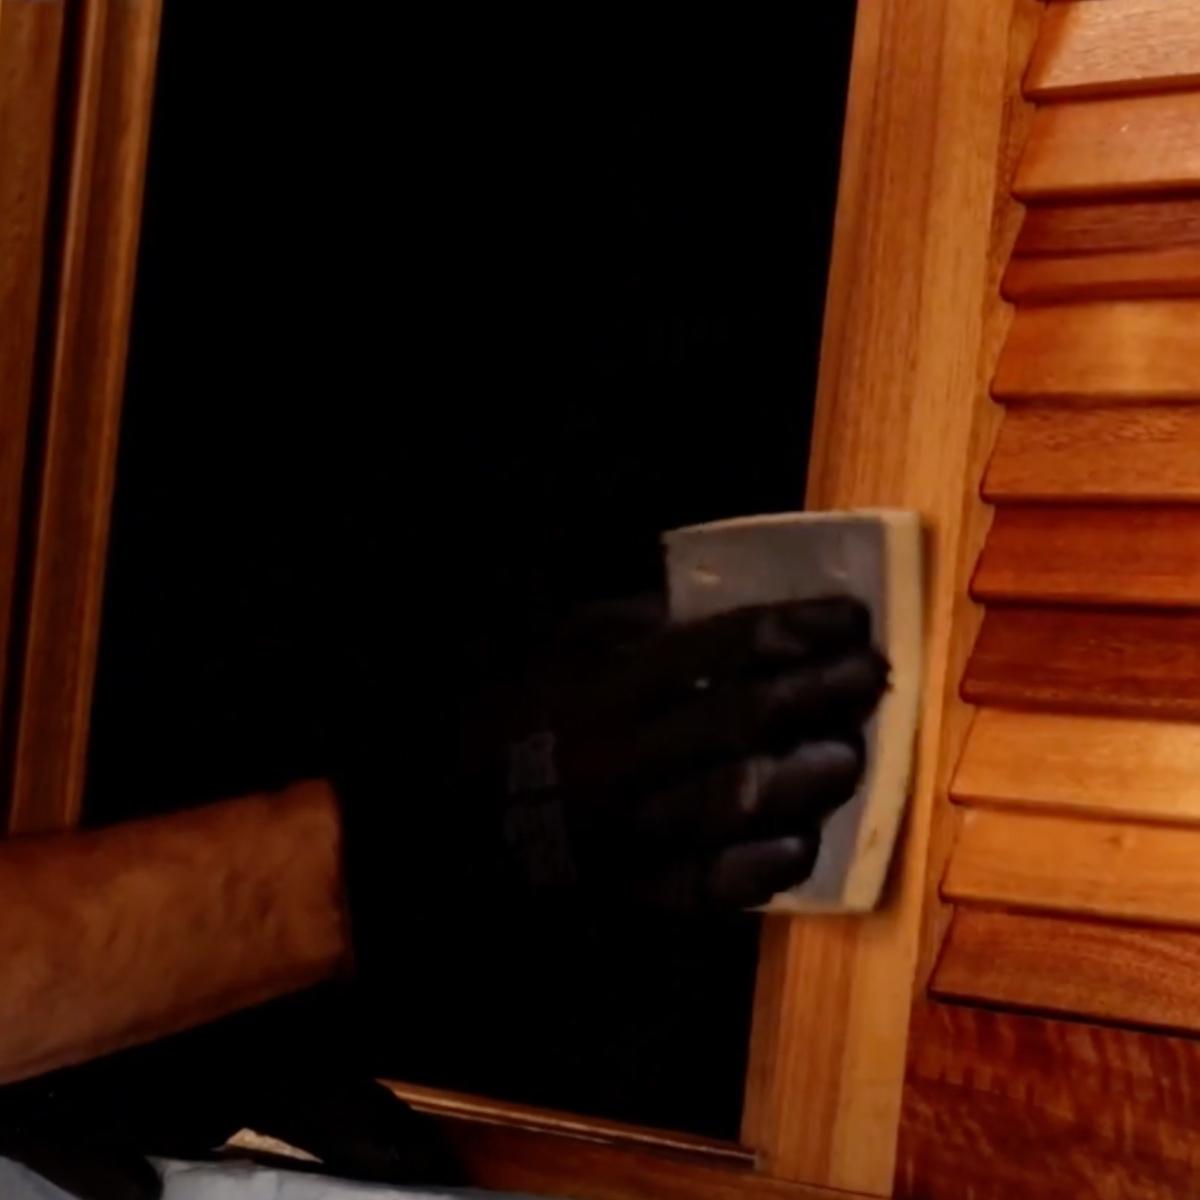 Esponja Lixa Abrasiva Dupla Baixa Condor 860 - 2 UNI